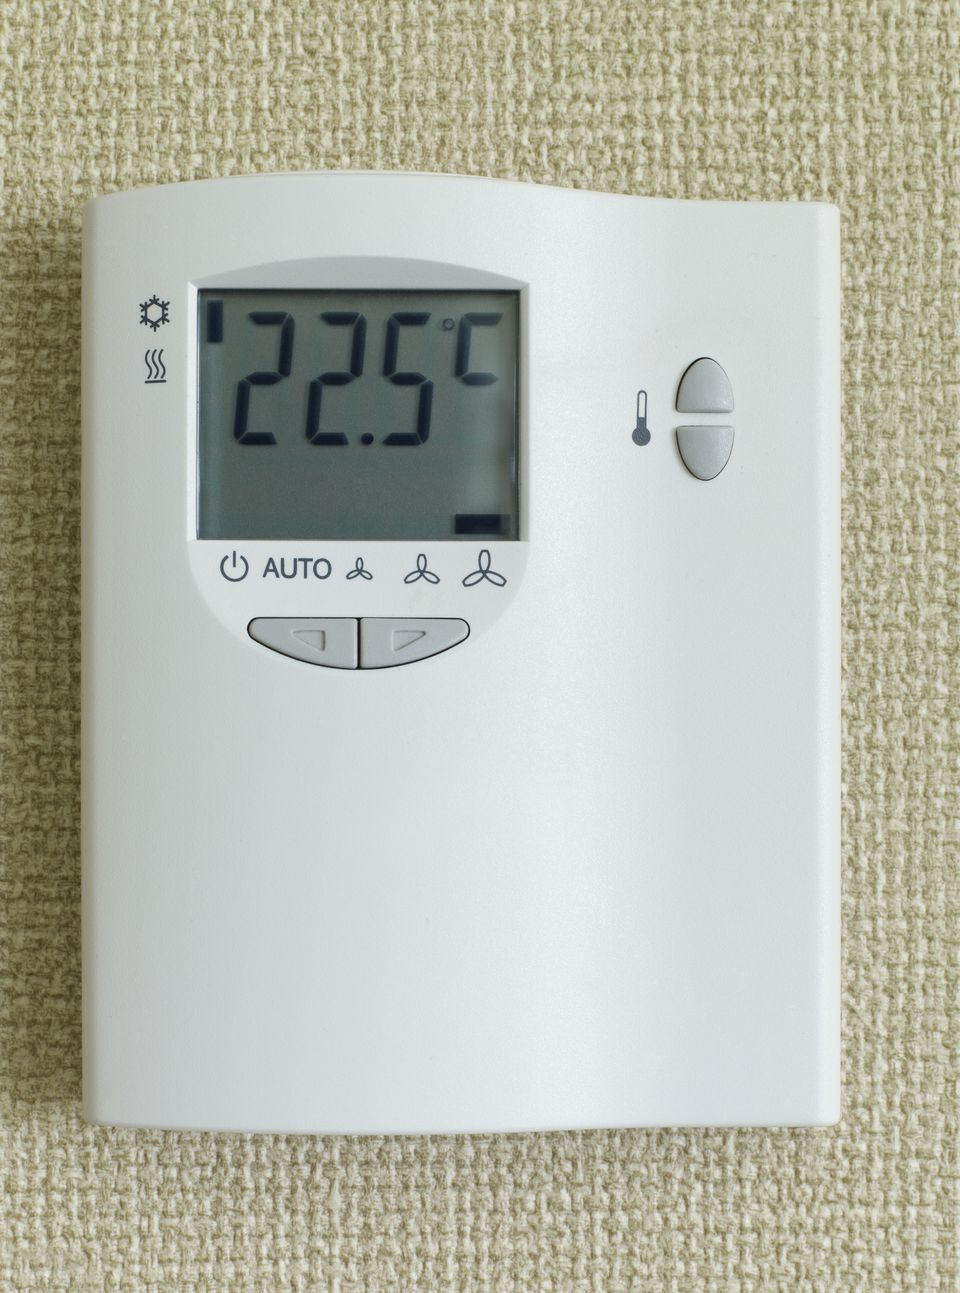 24Volt Thermostat Wiring For SingleStage Heat Pump Systems – Kenmore Heat Pump Thermostat Wiring Diagrams